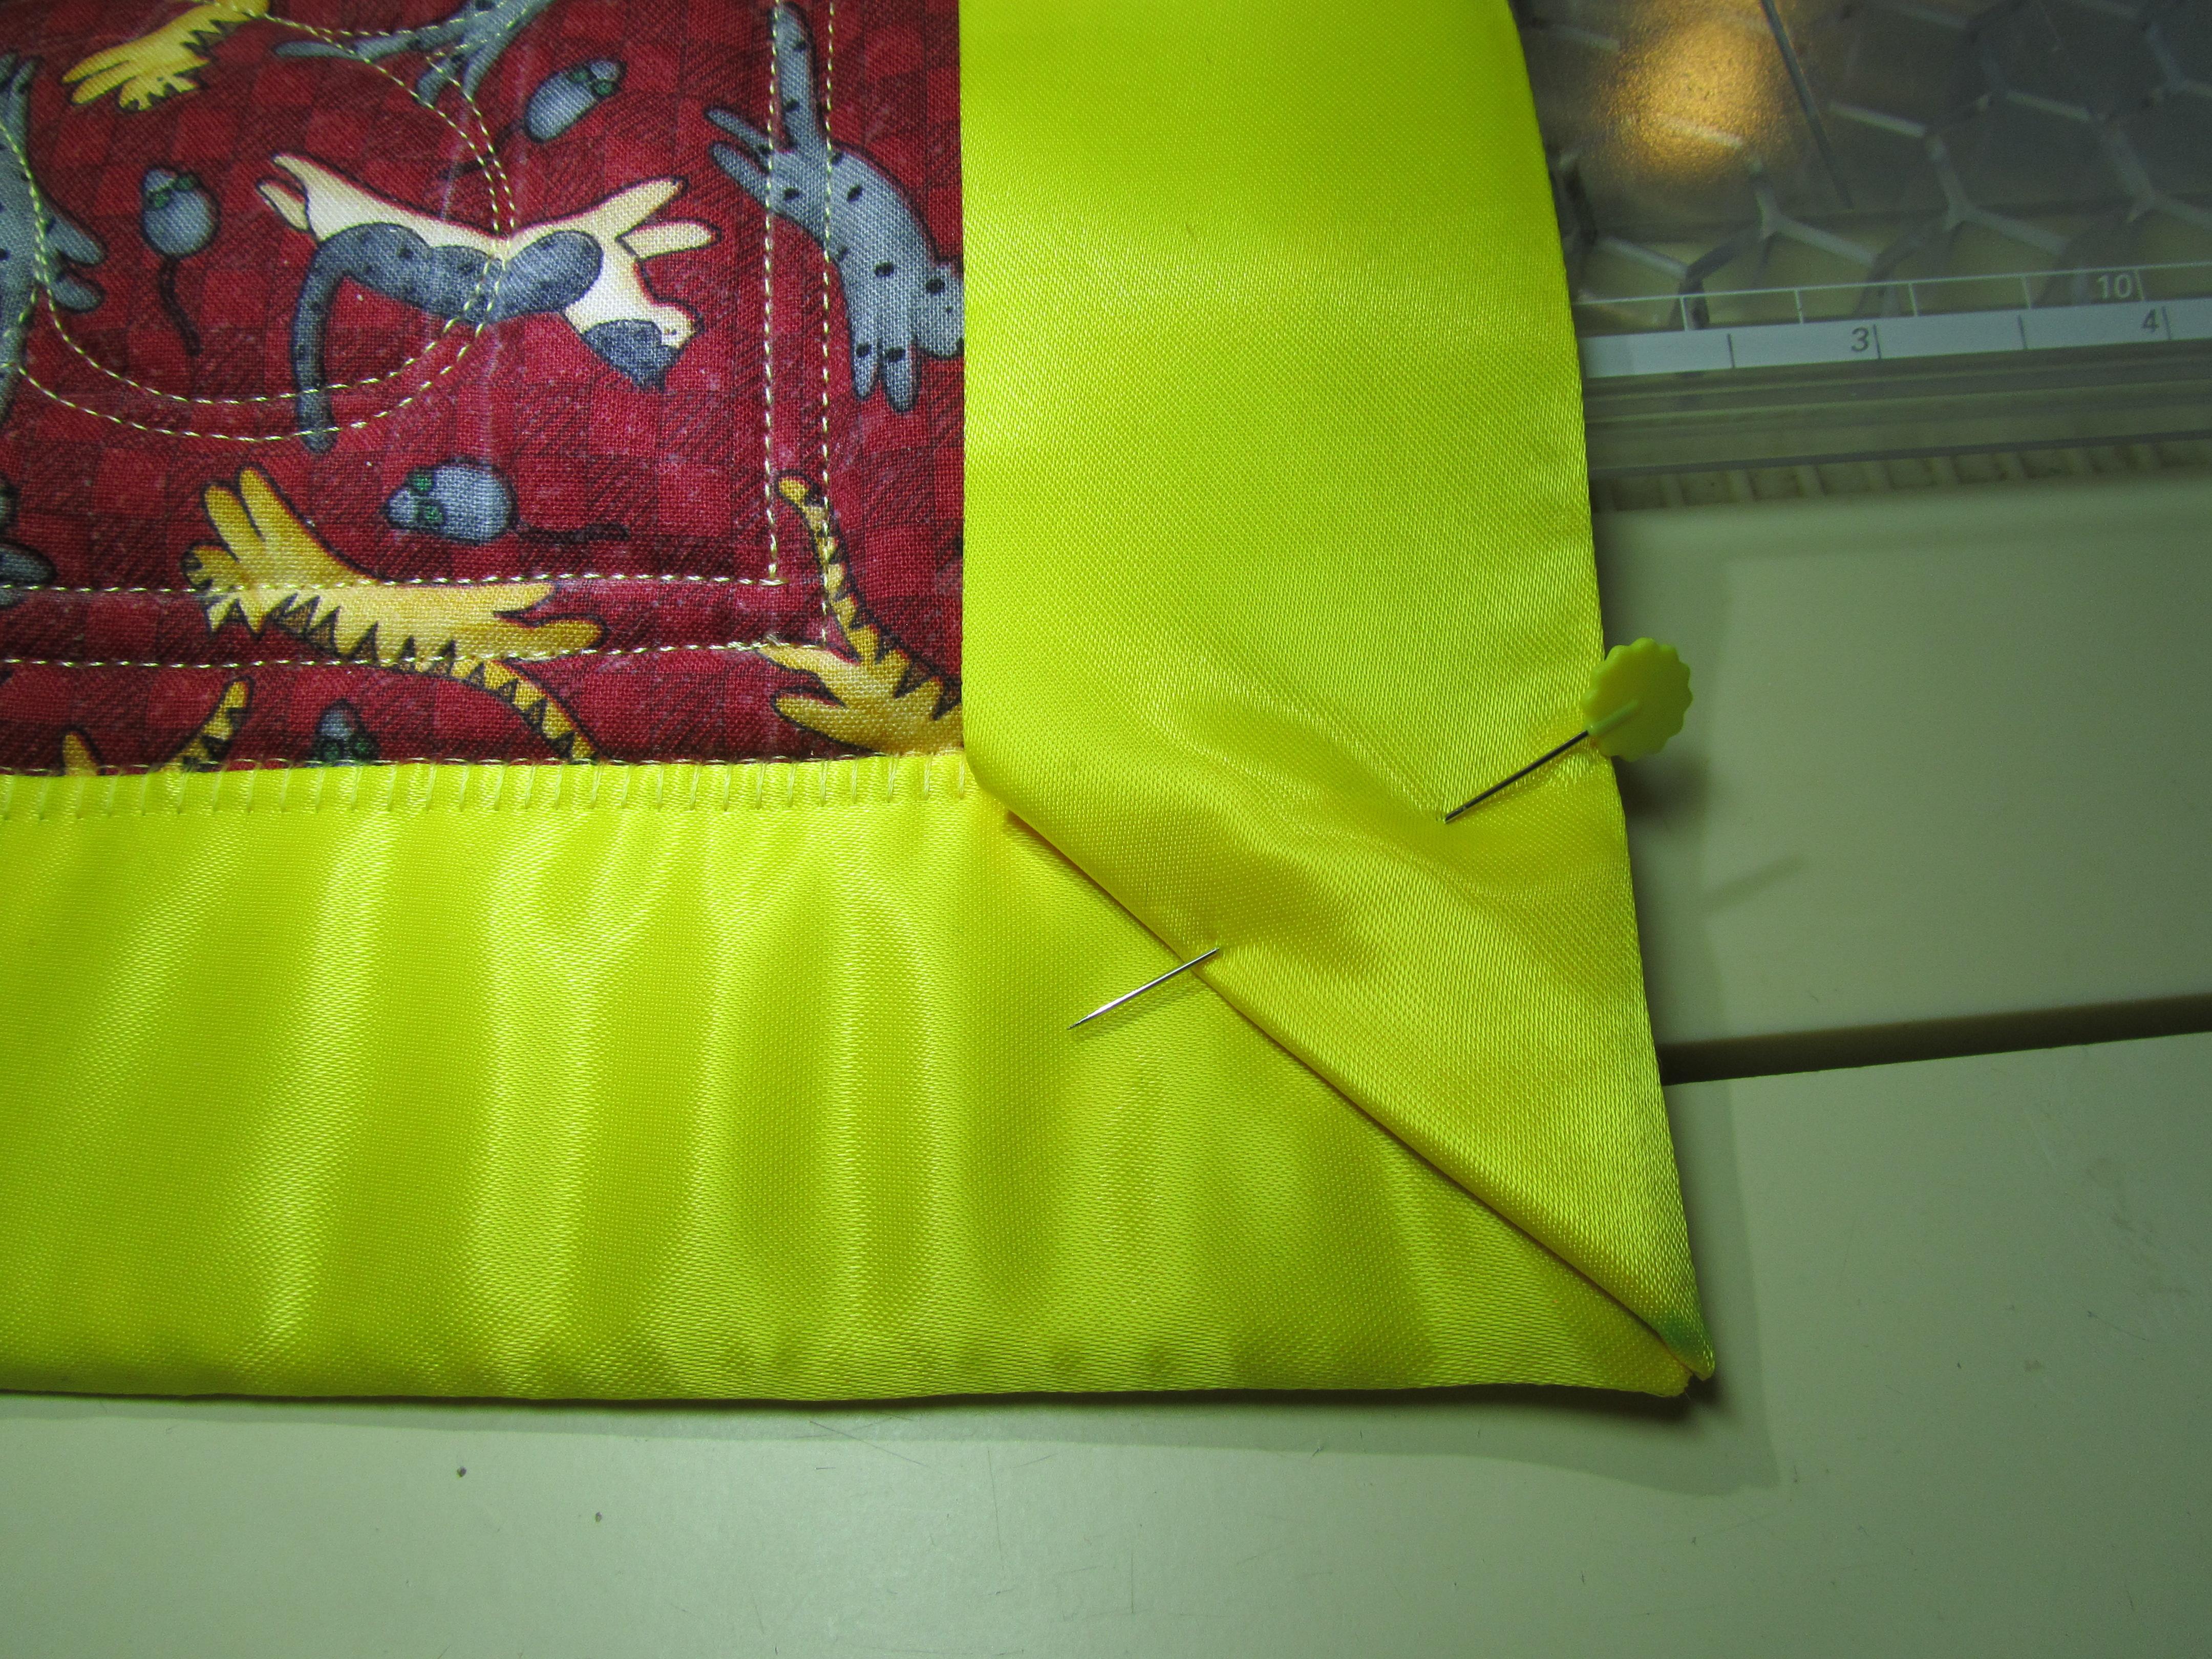 Blanket Binding Tutorial | Evening in the Garden Quilts : putting binding on a quilt - Adamdwight.com